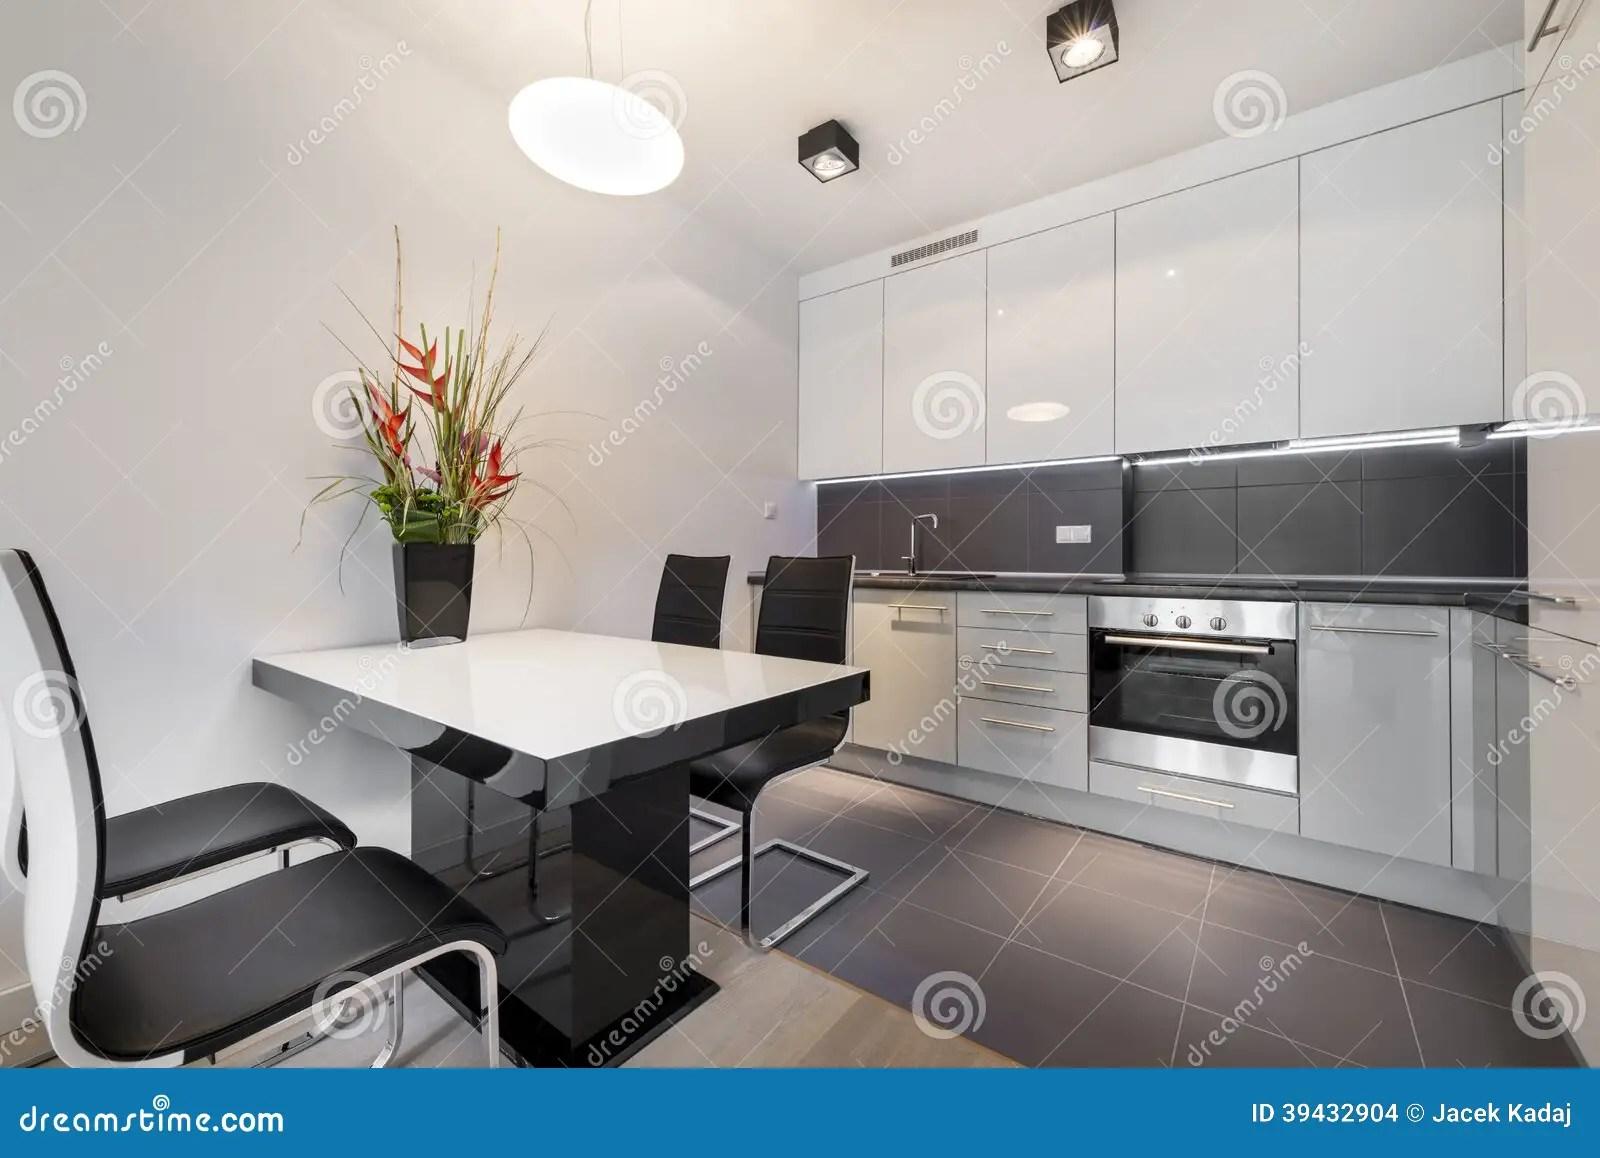 Pavimenti Per Cucine Moderne   Pavimenti Cucina Guida Alla Scelta ...